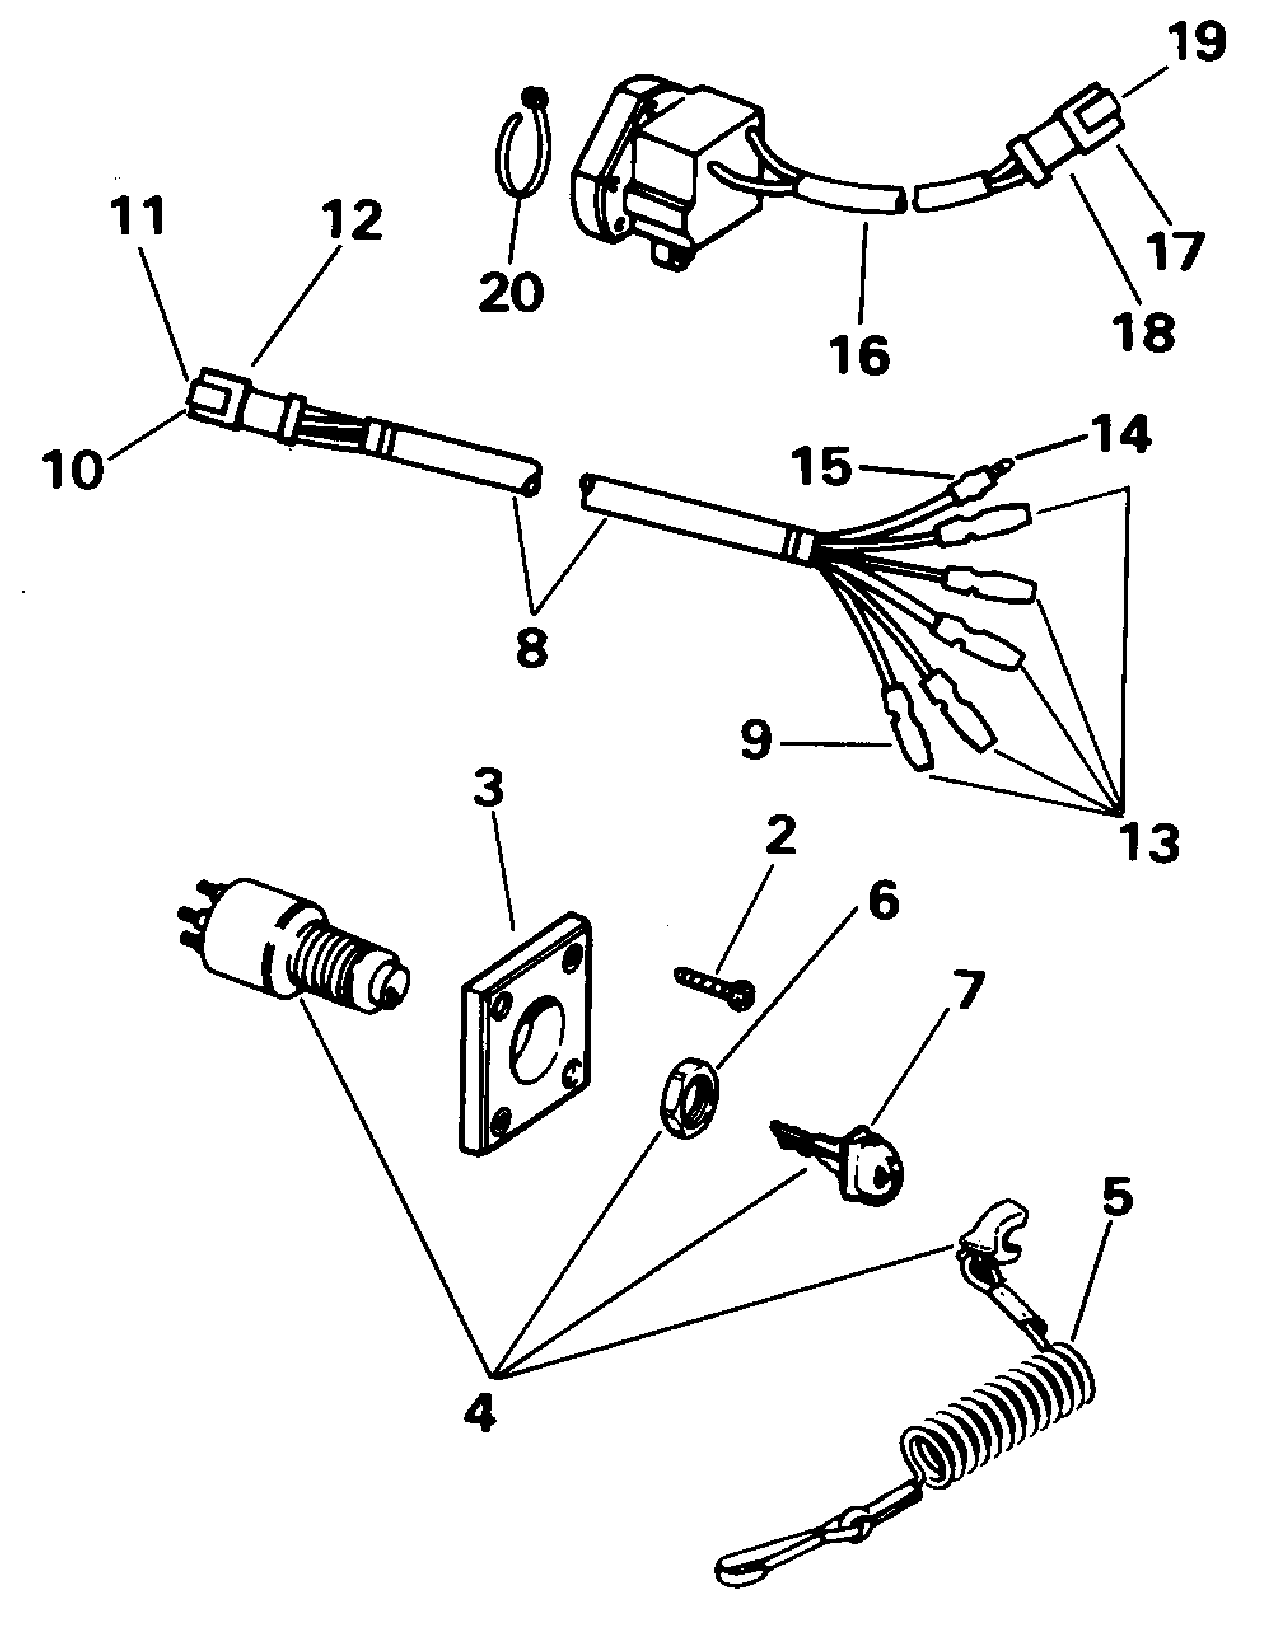 ZB_6308] Omc 5005801 Ignition Switch Wiring Diagram Free Diagram